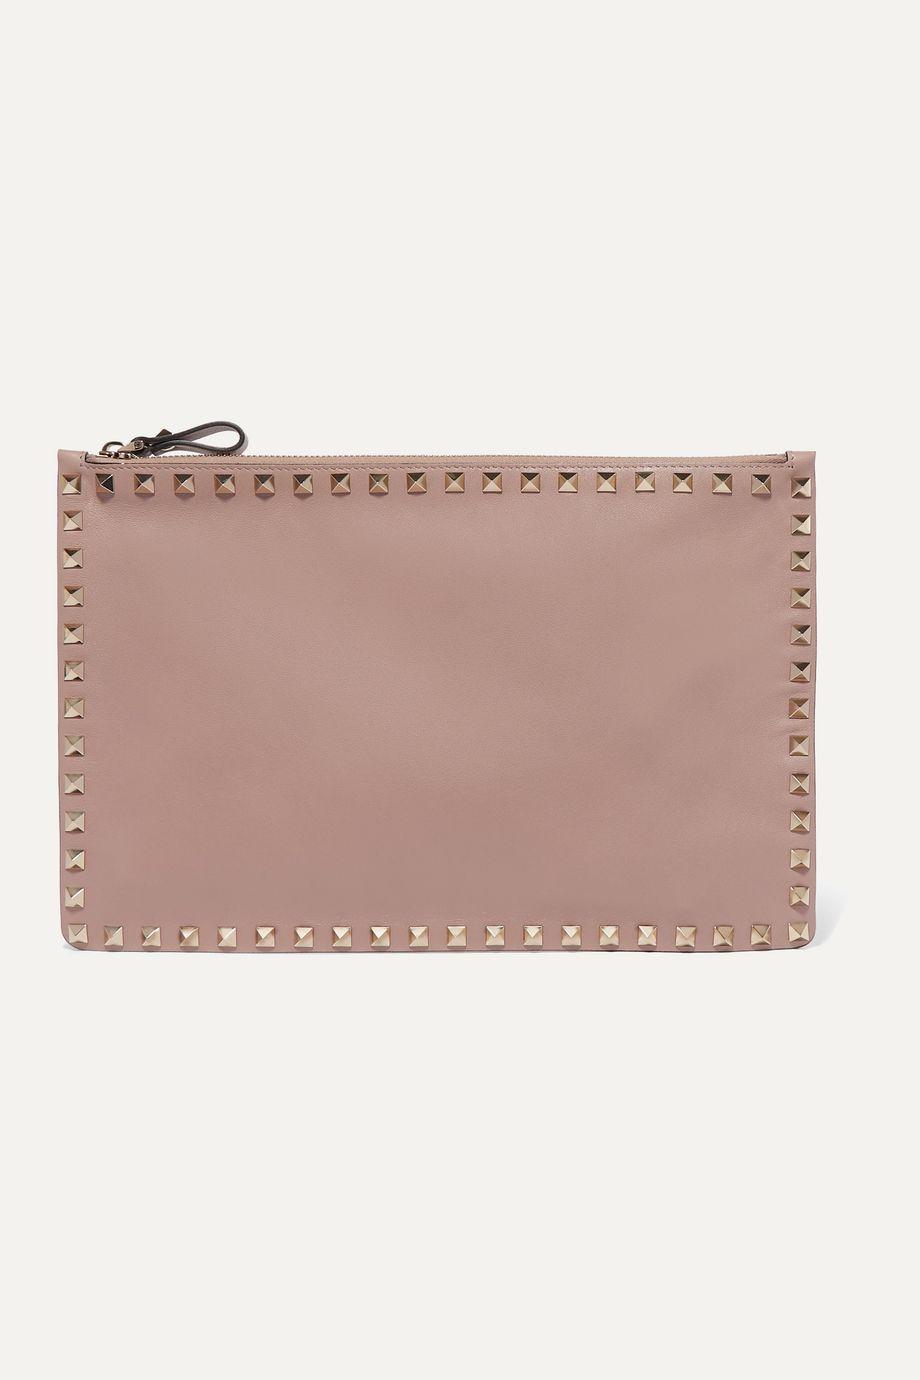 Valentino Valentino Garavani The Rockstud large leather pouch